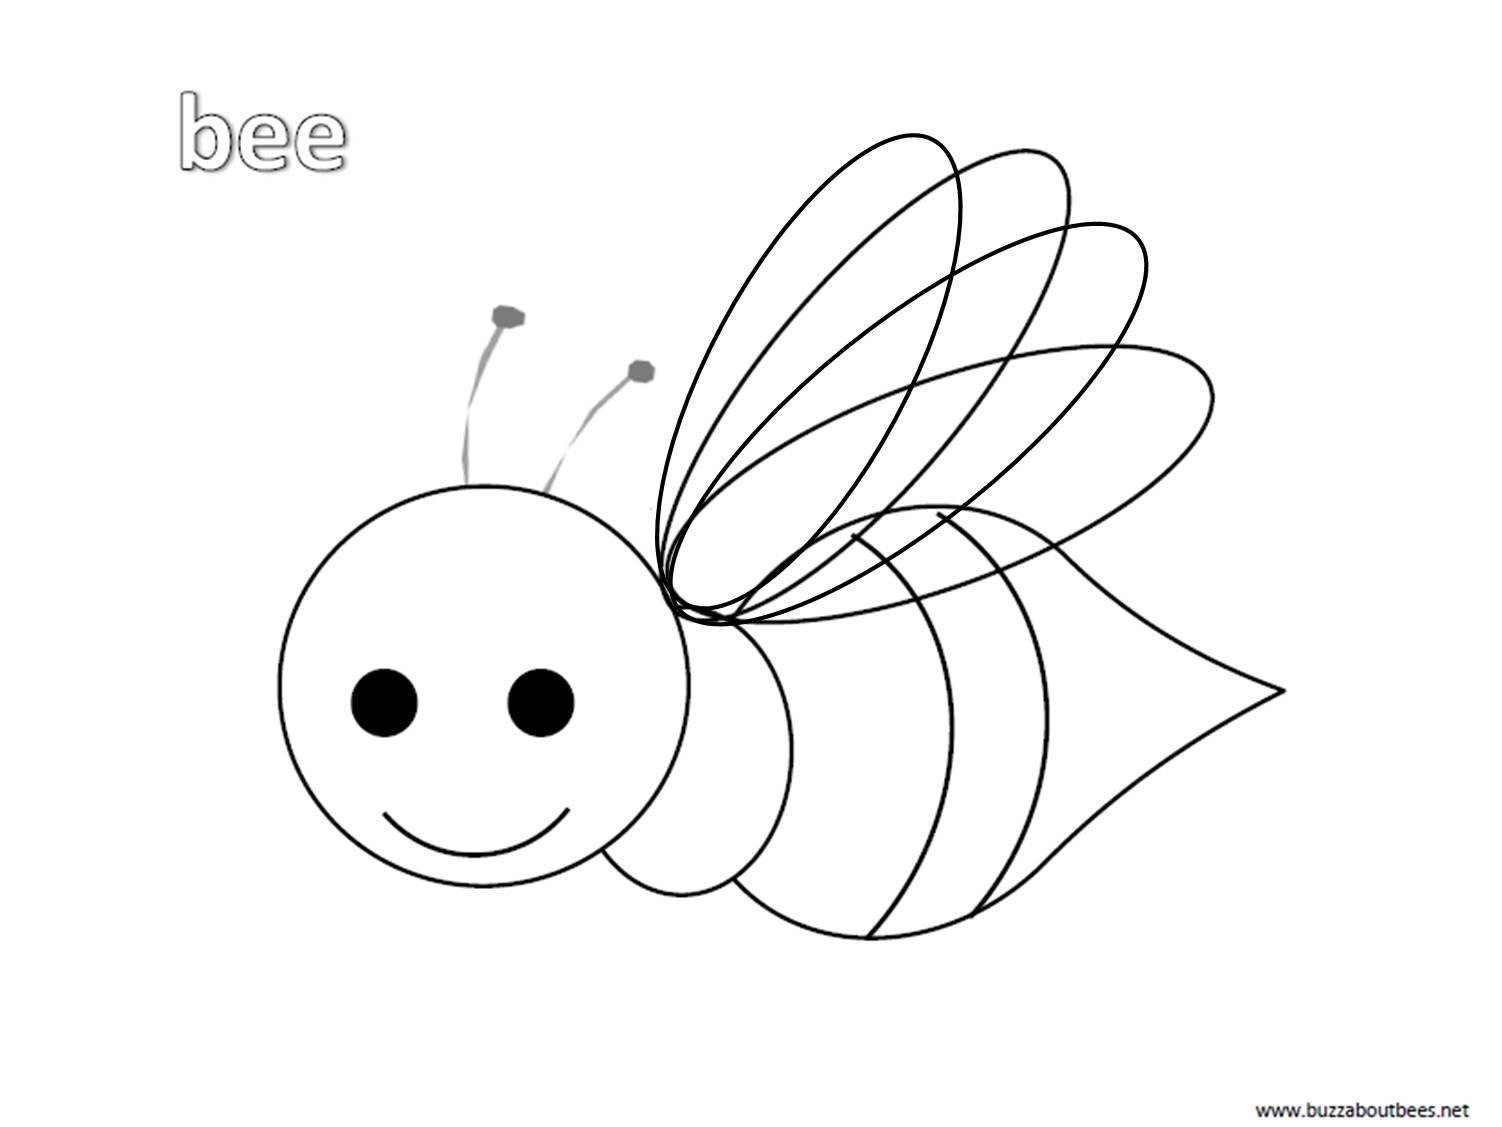 beehive coloring page free printable bee coloring pages for kids page beehive coloring